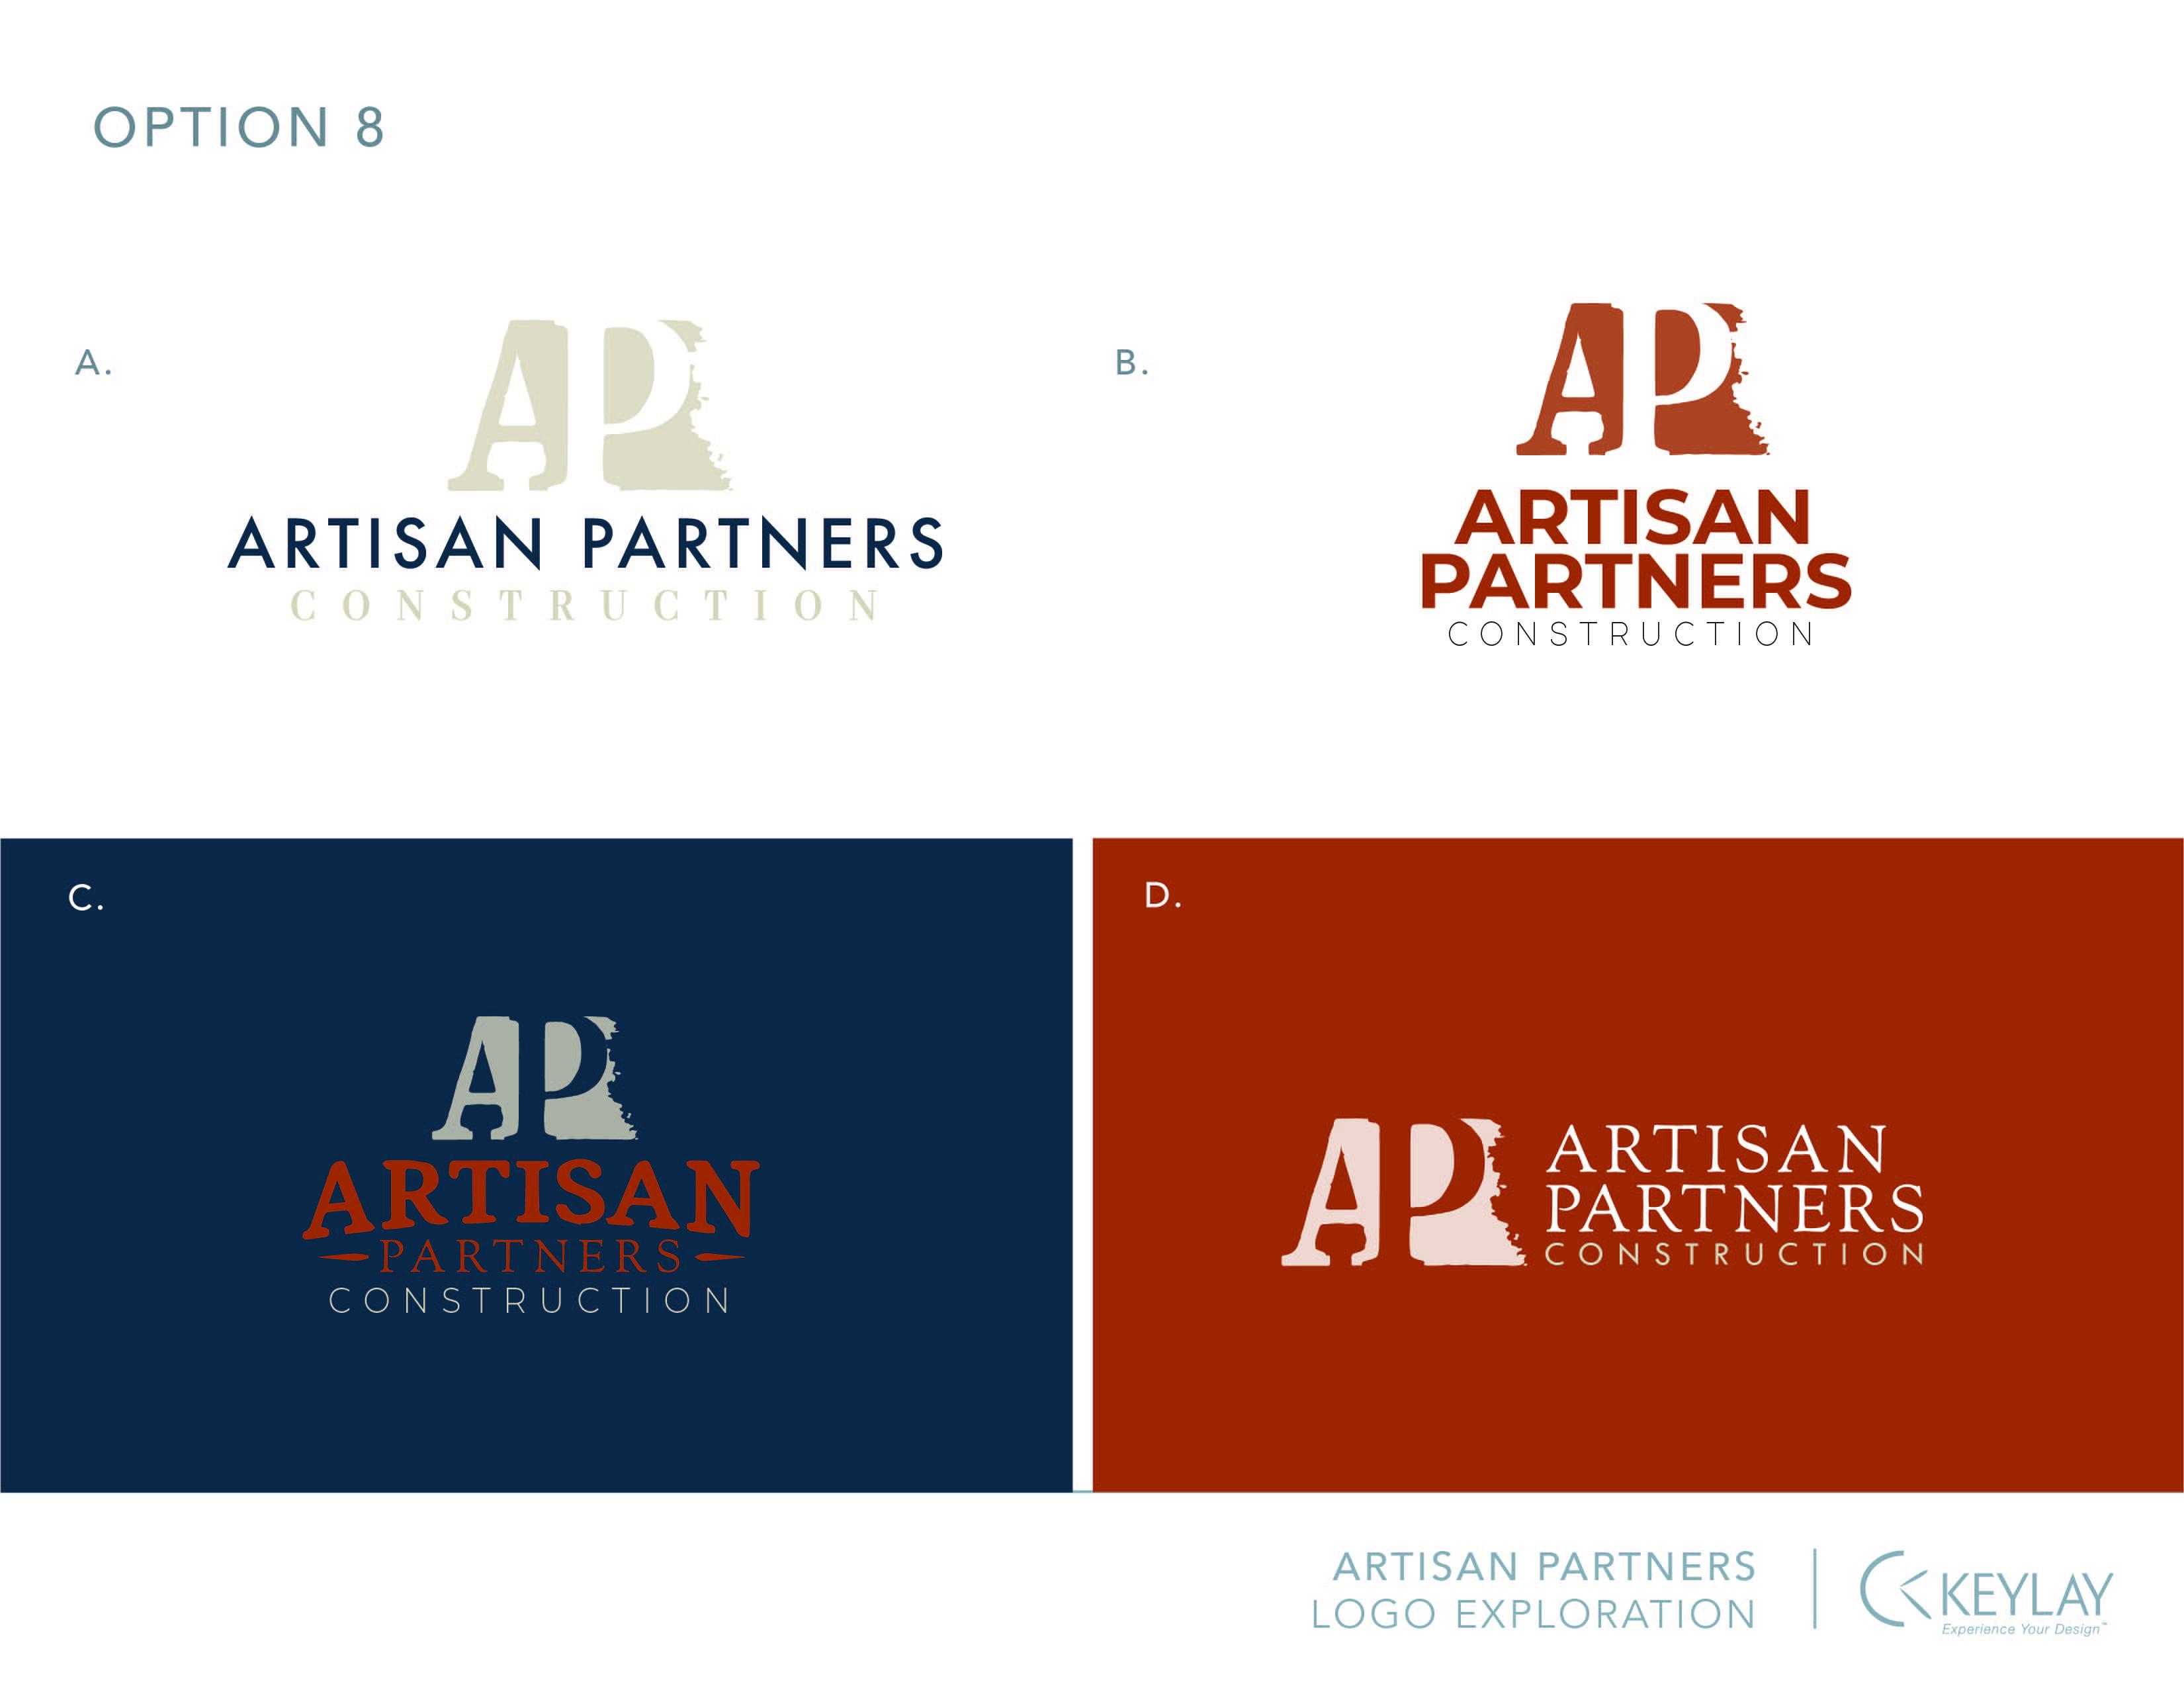 Artisan Partners